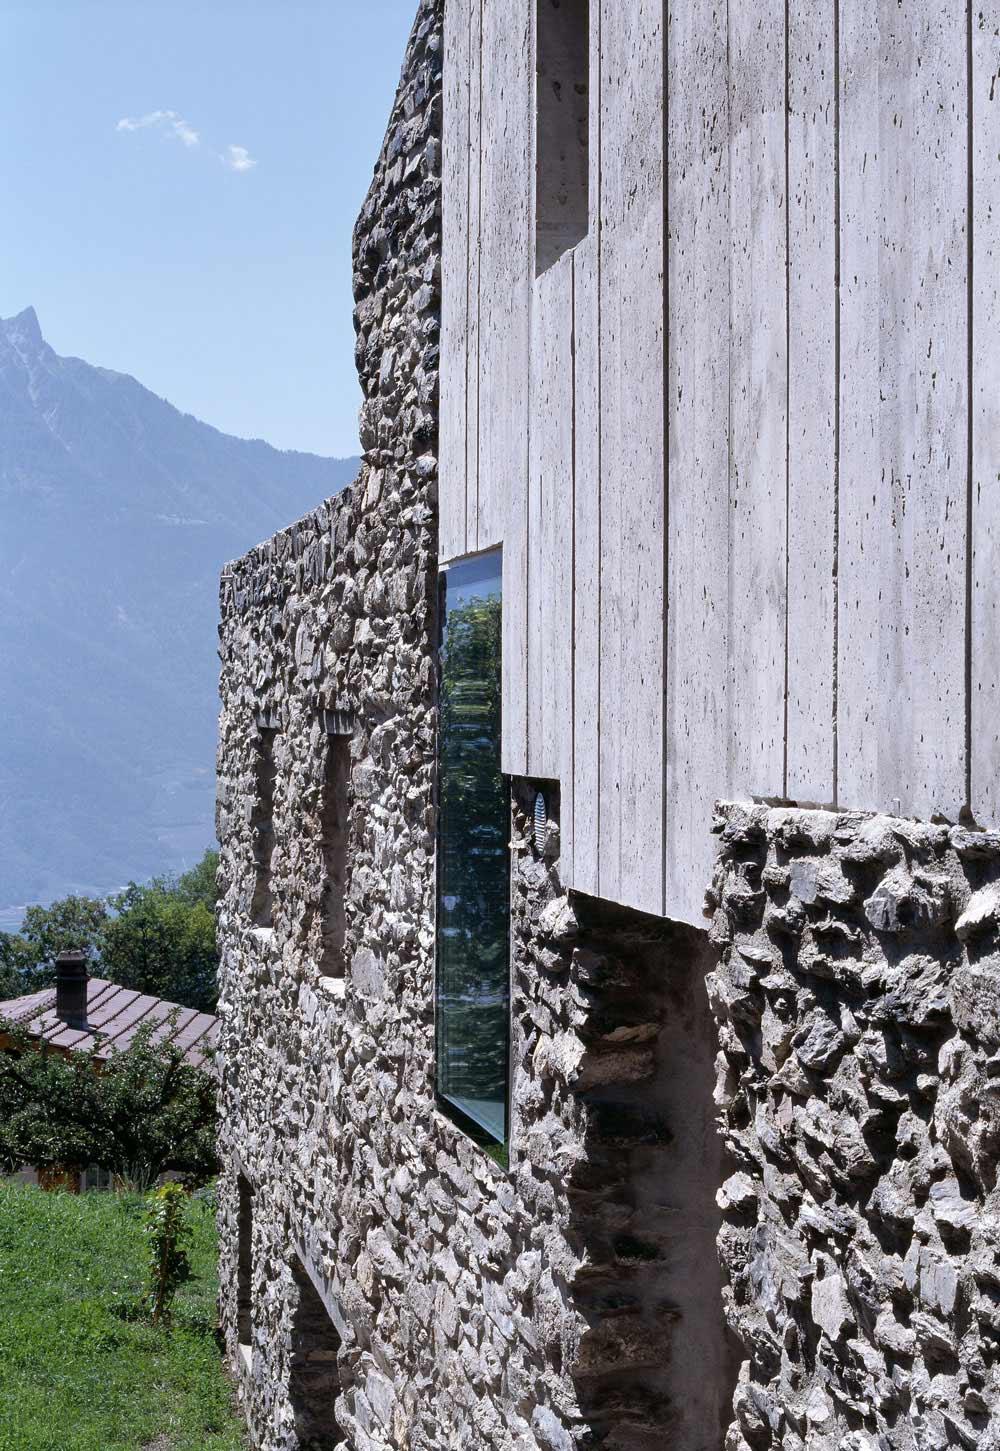 Exposed Concrete, Stone Walls, Renovation in Chamoson, Switzerland by Savioz Fabrizzi Architecte